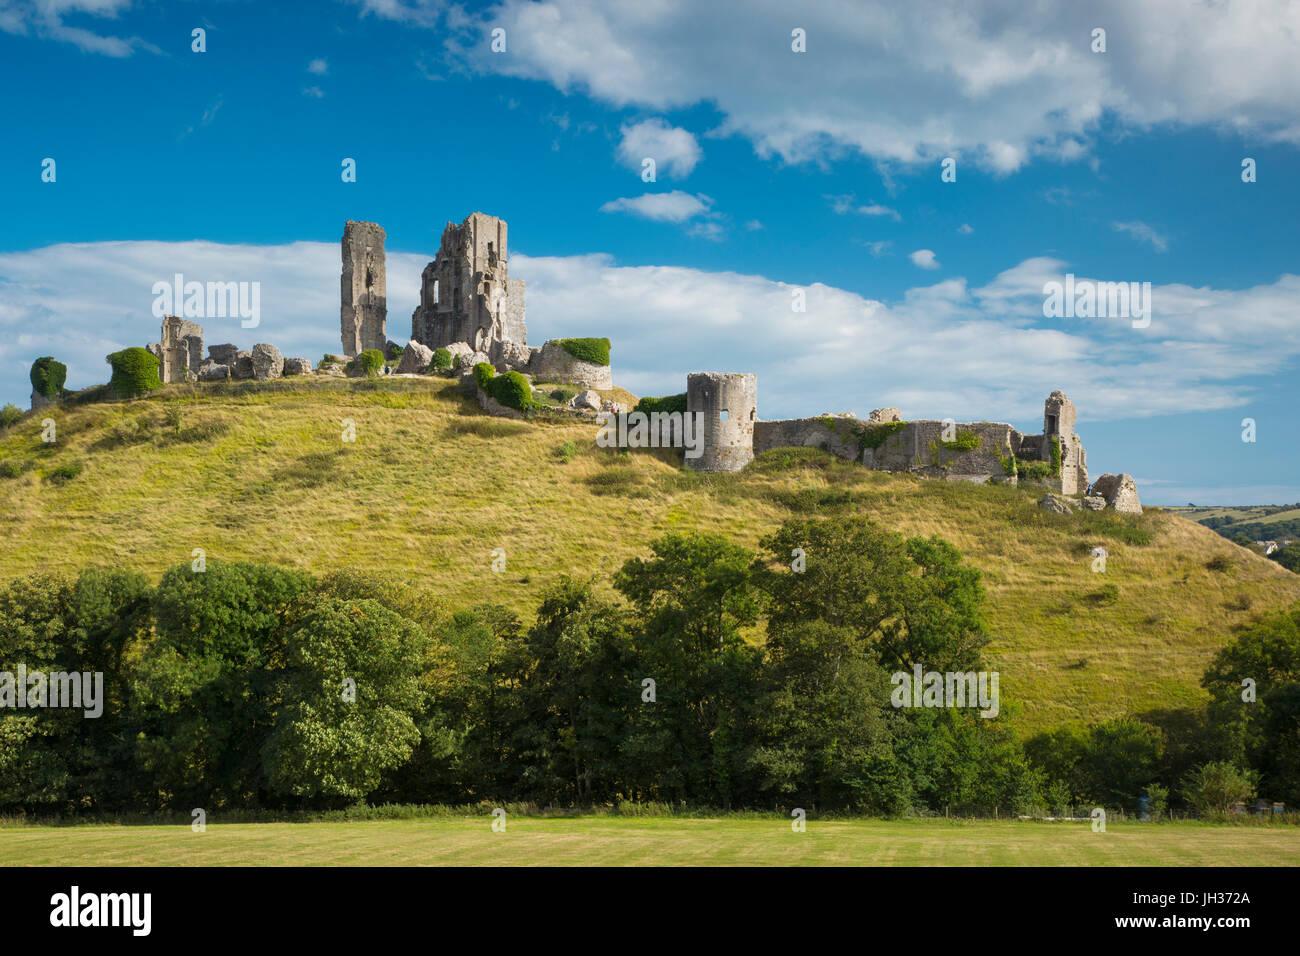 Ruinas de castillo Corfe cerca de Wareham, Isla de Purbeck, Dorset, Inglaterra Foto de stock